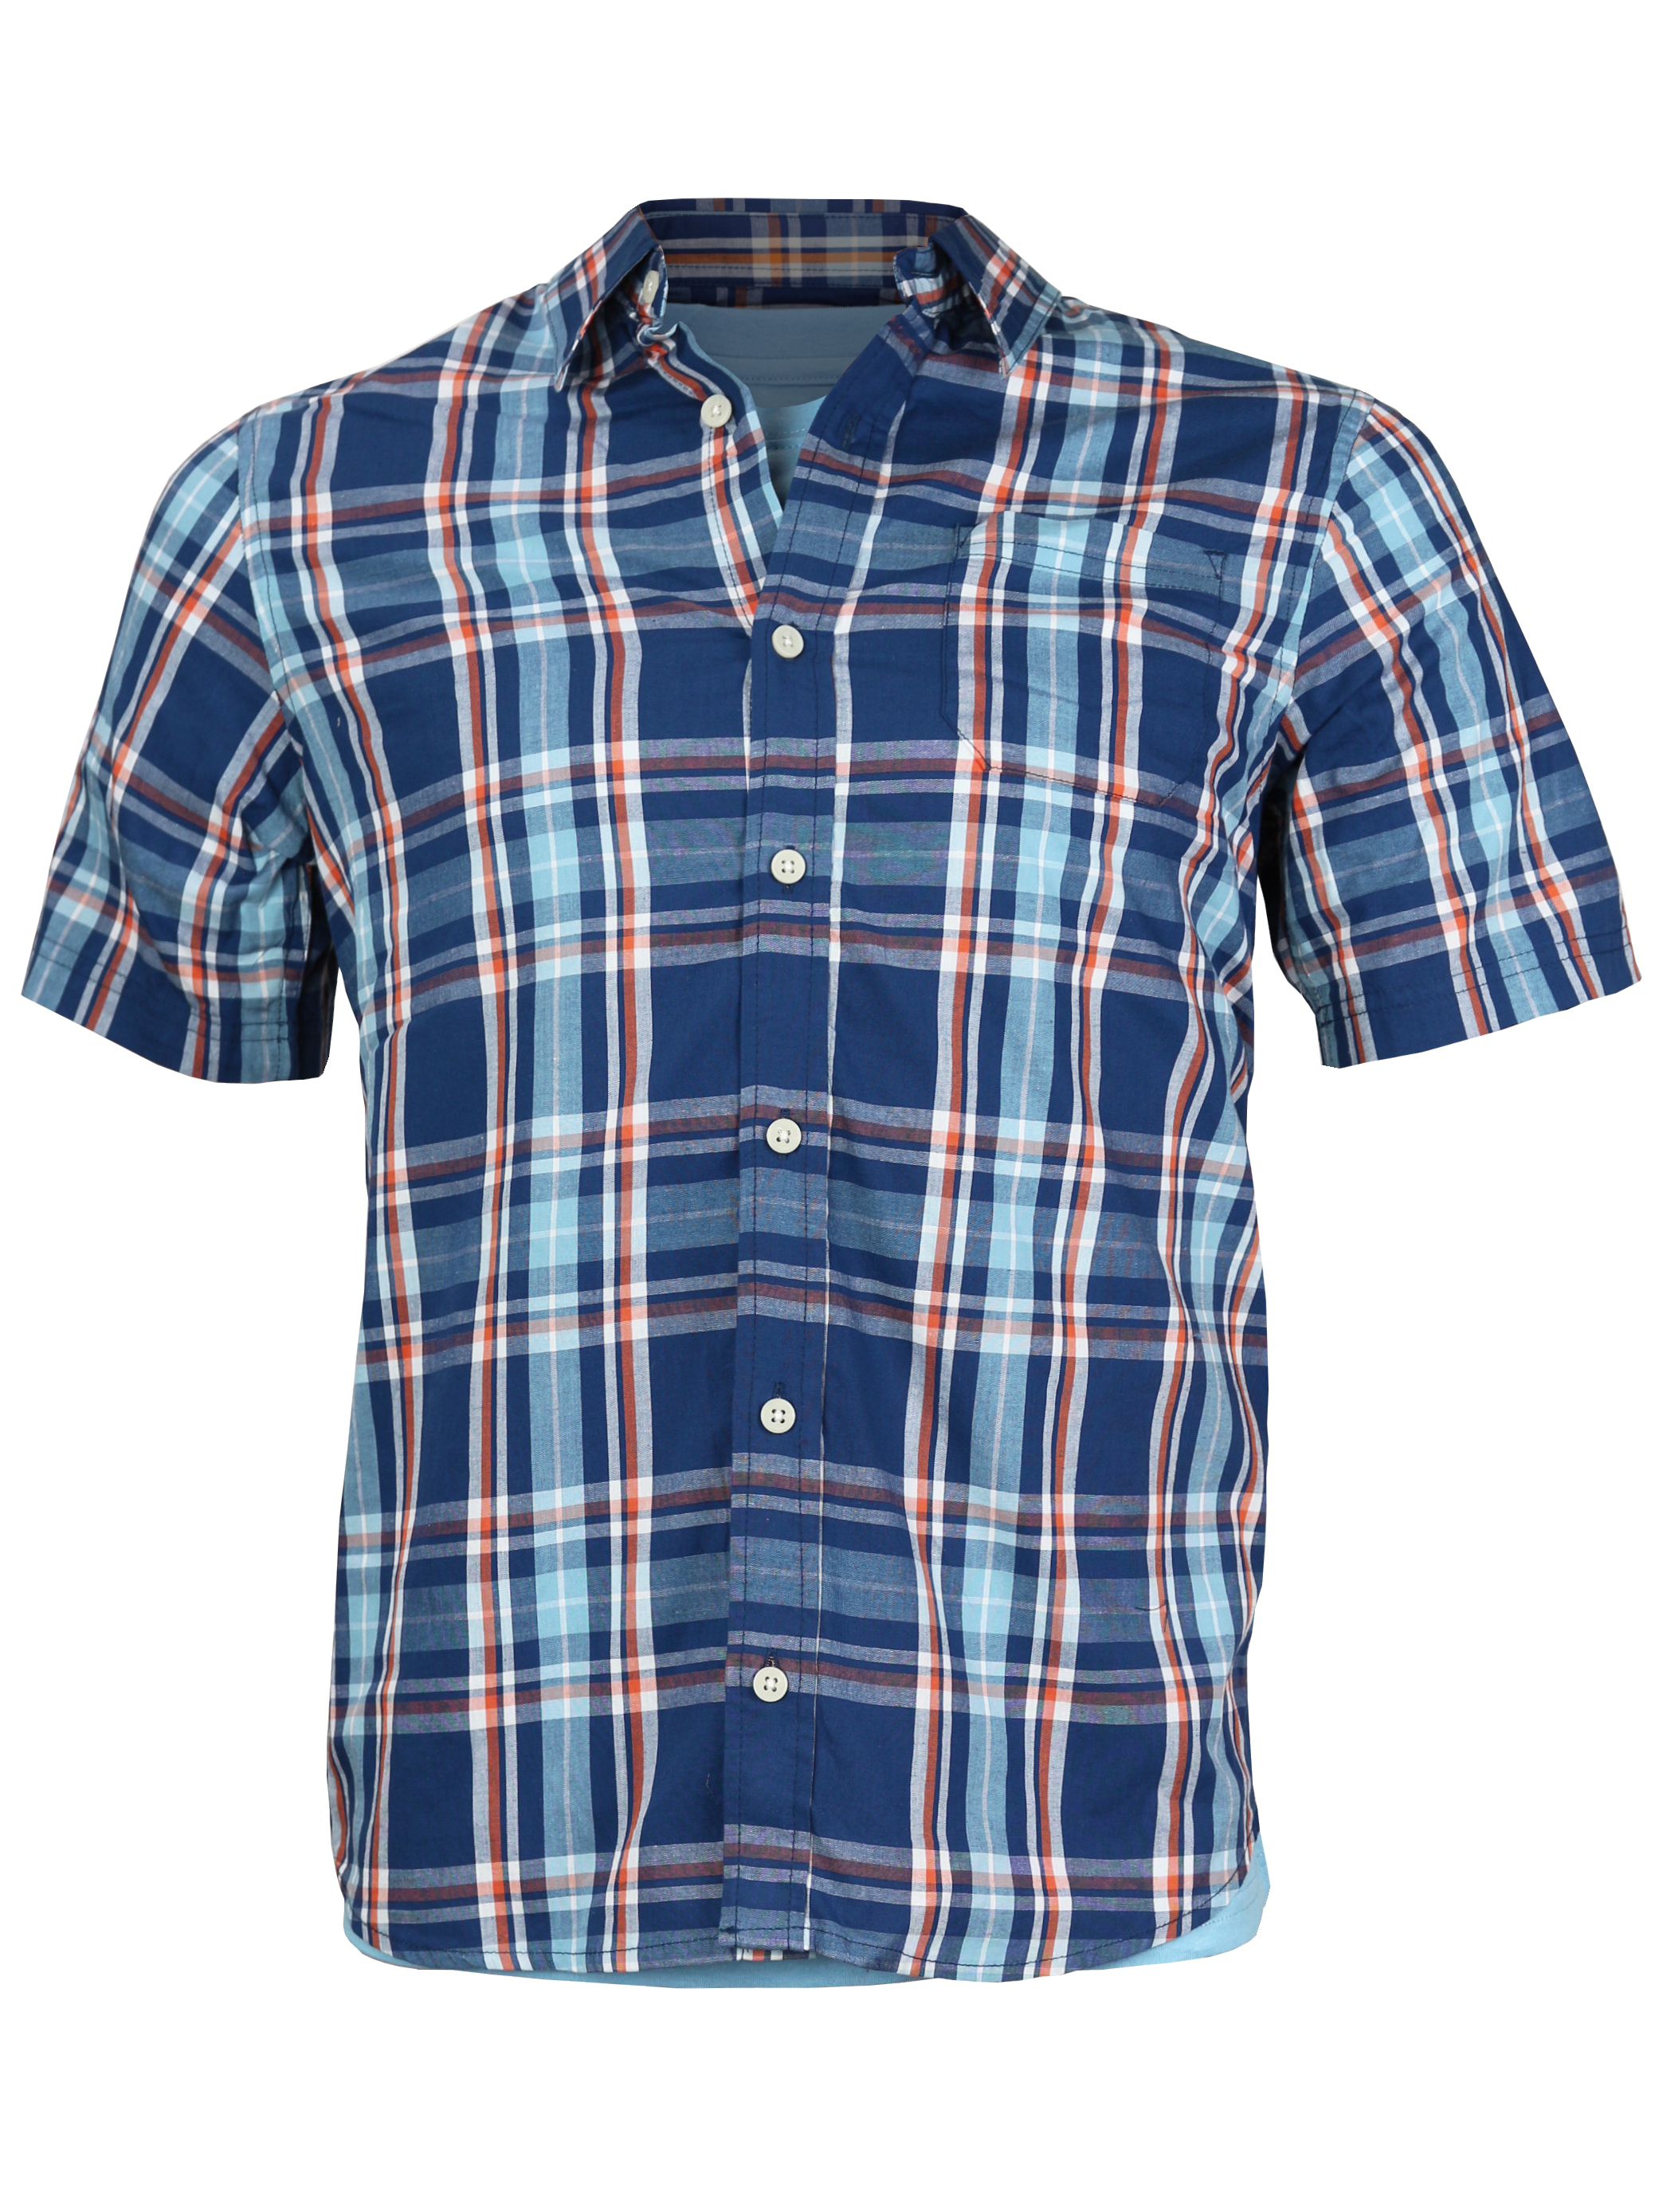 Urban Pipeline Boys Kids Plaid Short Sleeve Casual Dress Shirt W